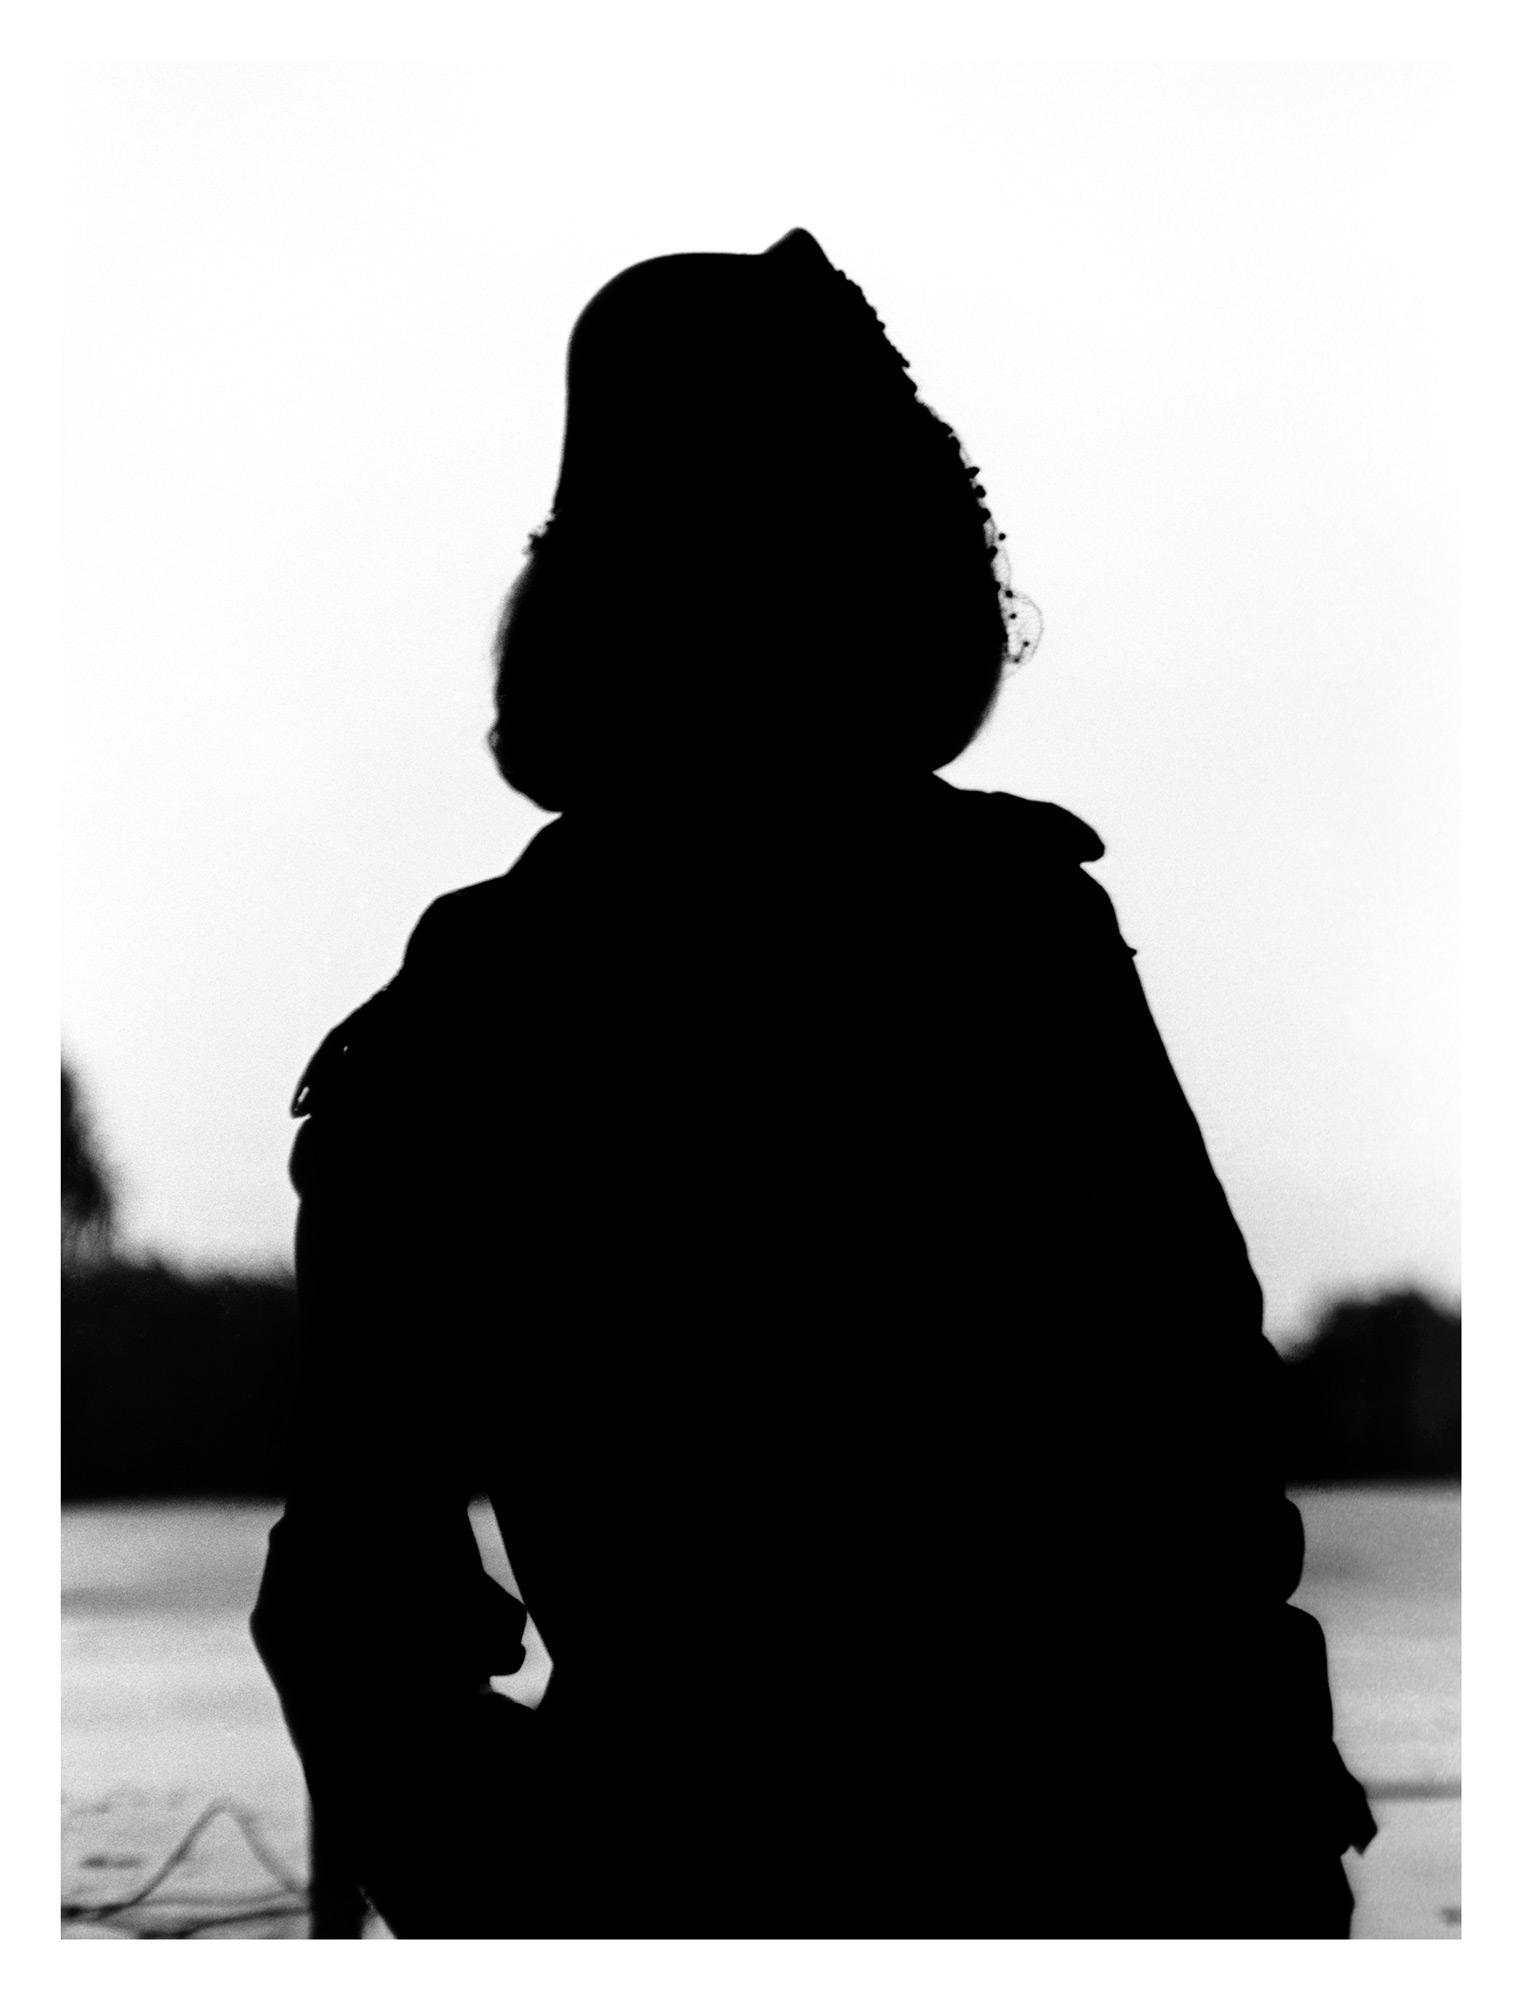 ZC_Silhouette_no1.jpg